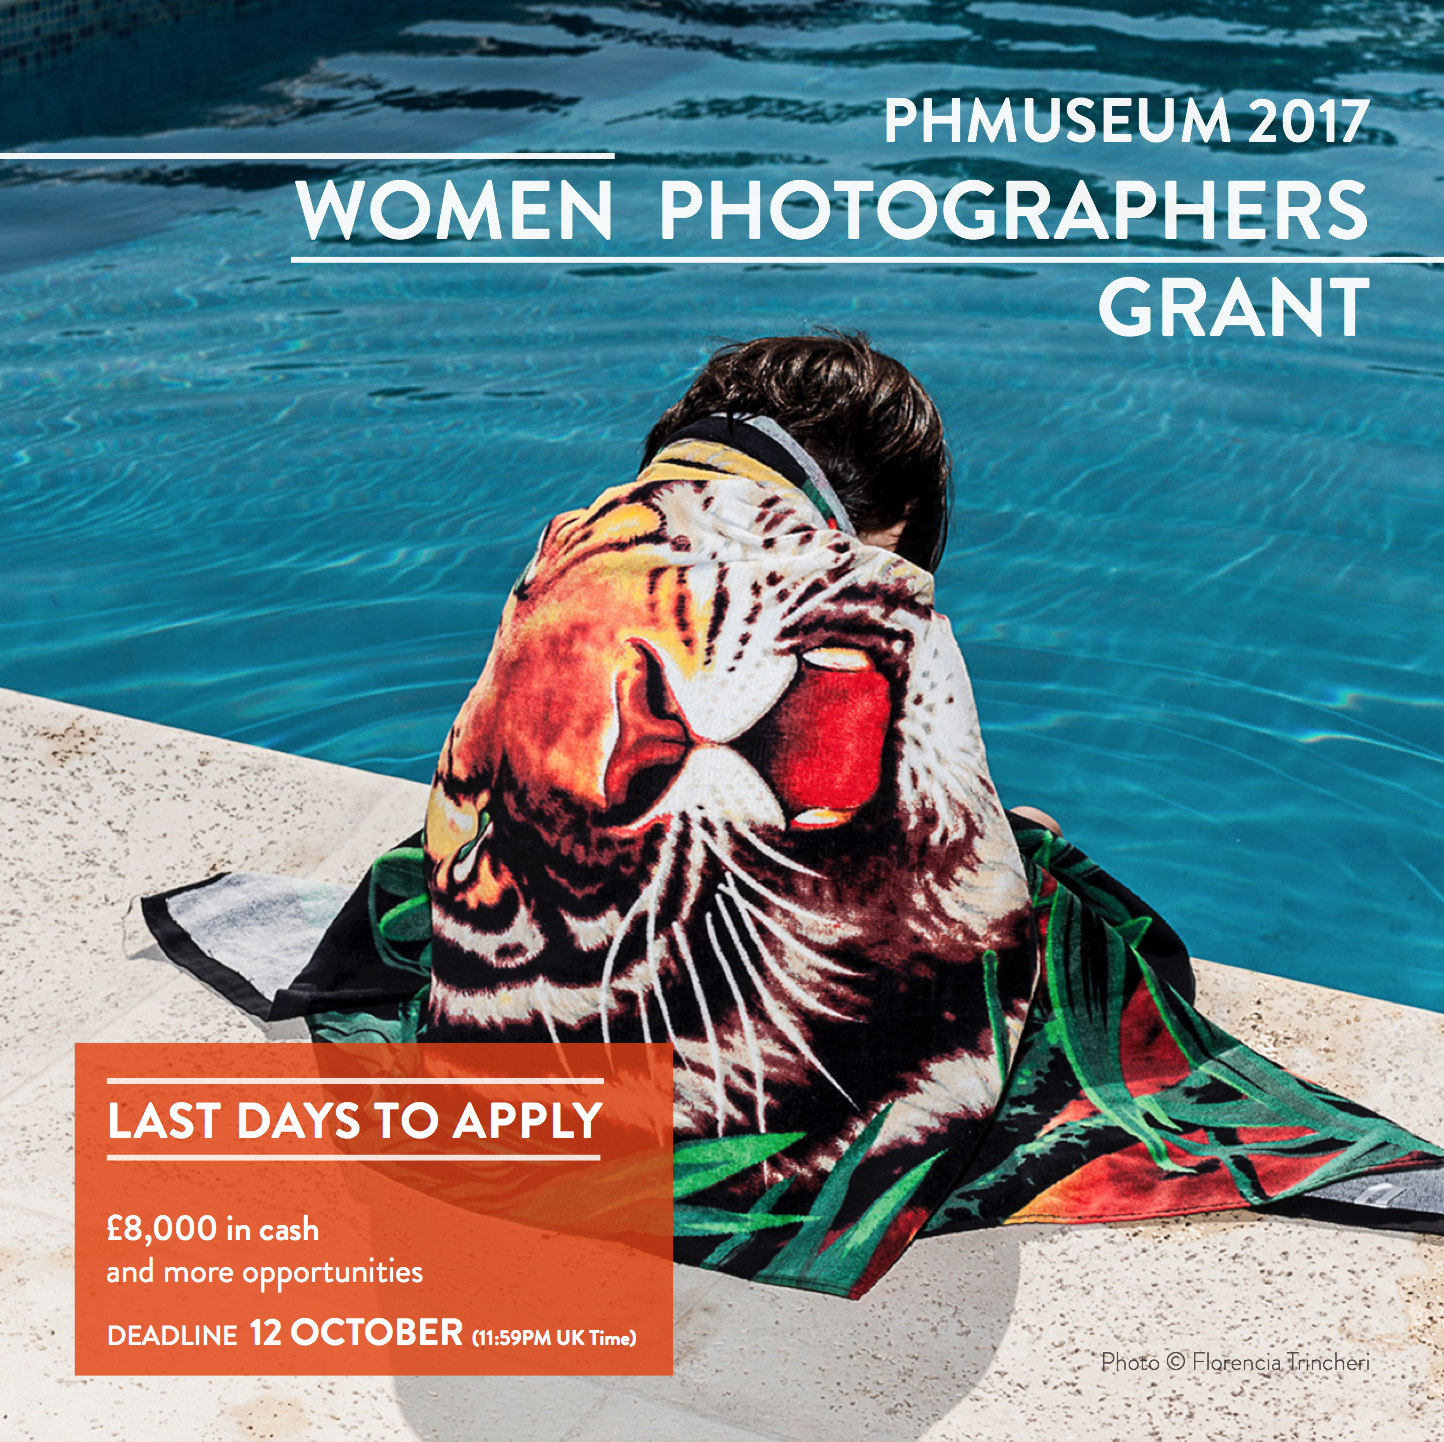 PHmuseum 2017 Women Photographers Grant - logo